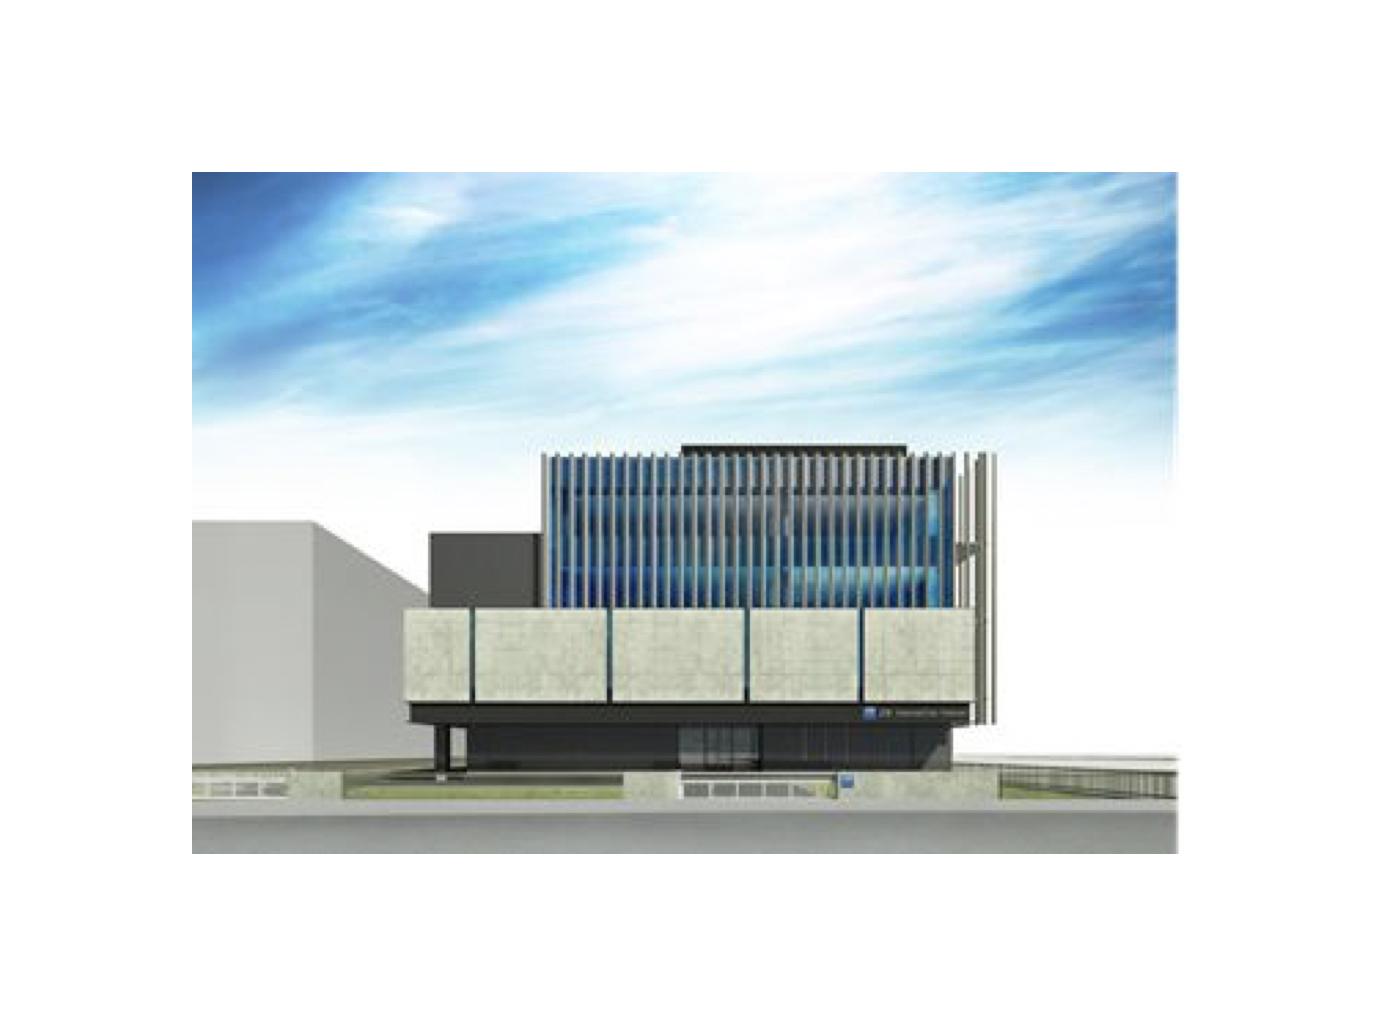 JSR | オープンイノベーション促進を目的とした新研究所を着工、2021年川崎市殿町に開所